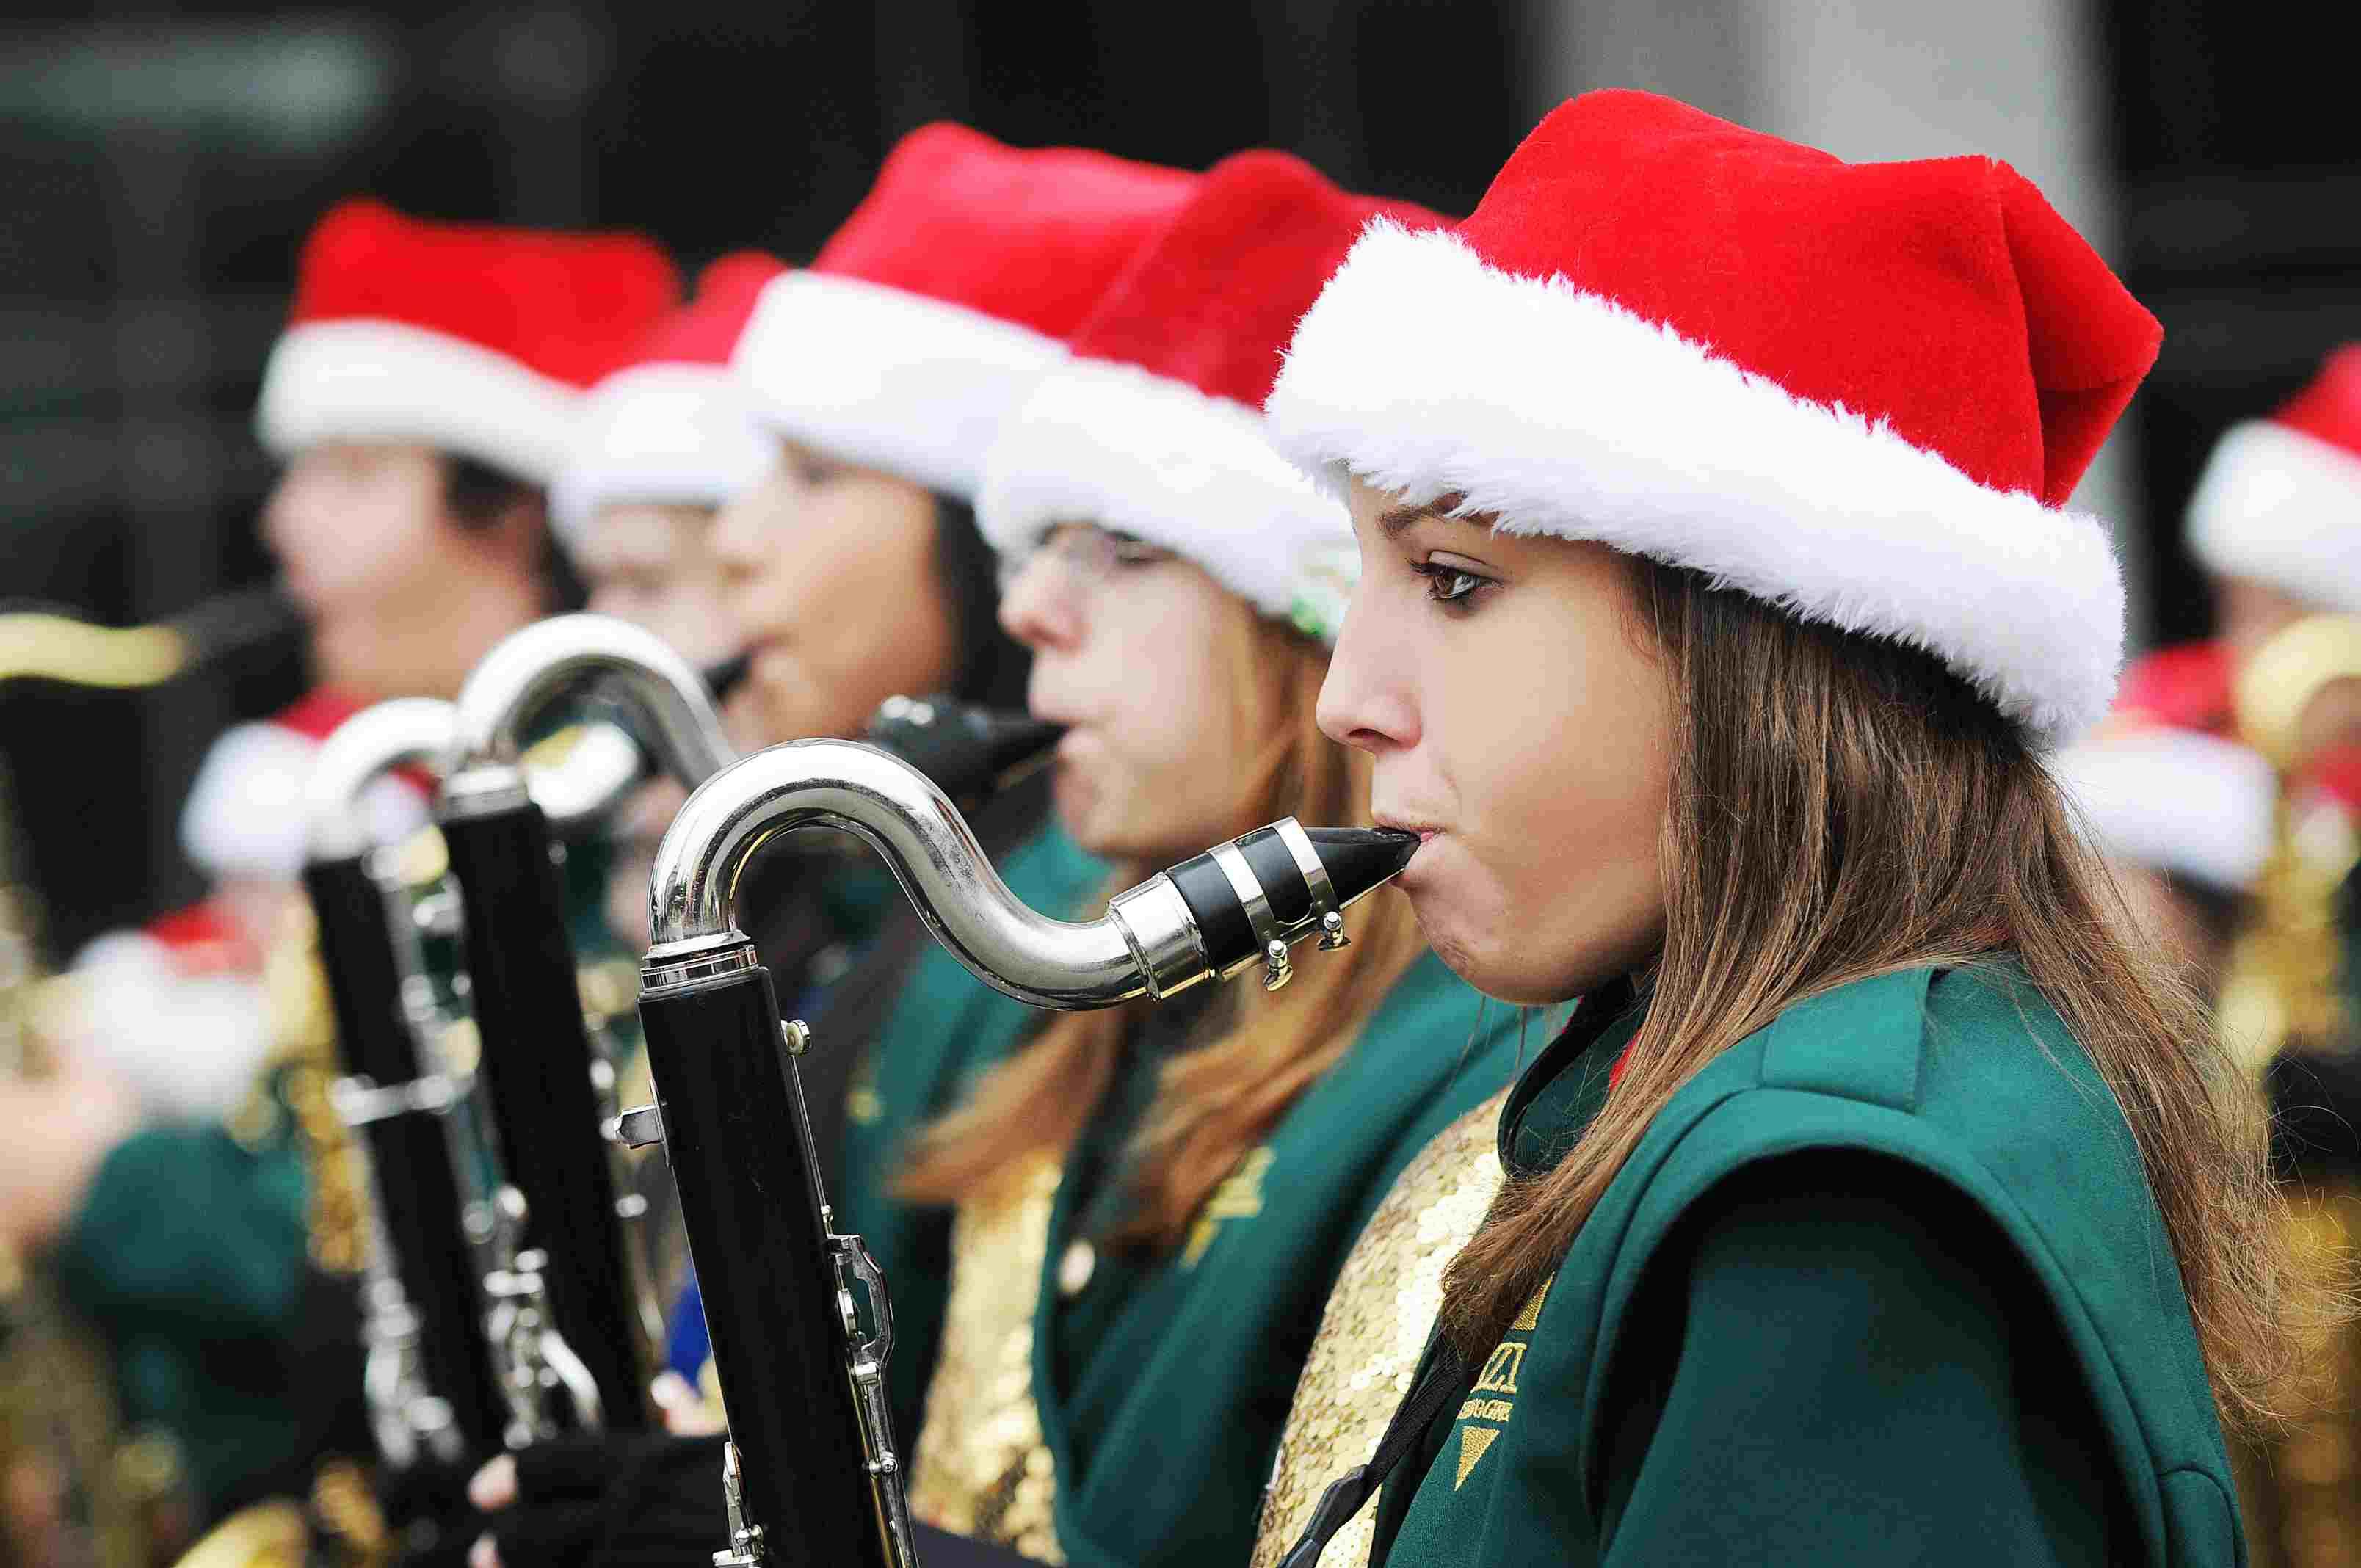 dallas holiday parade - Christmas Things To Do In Dallas